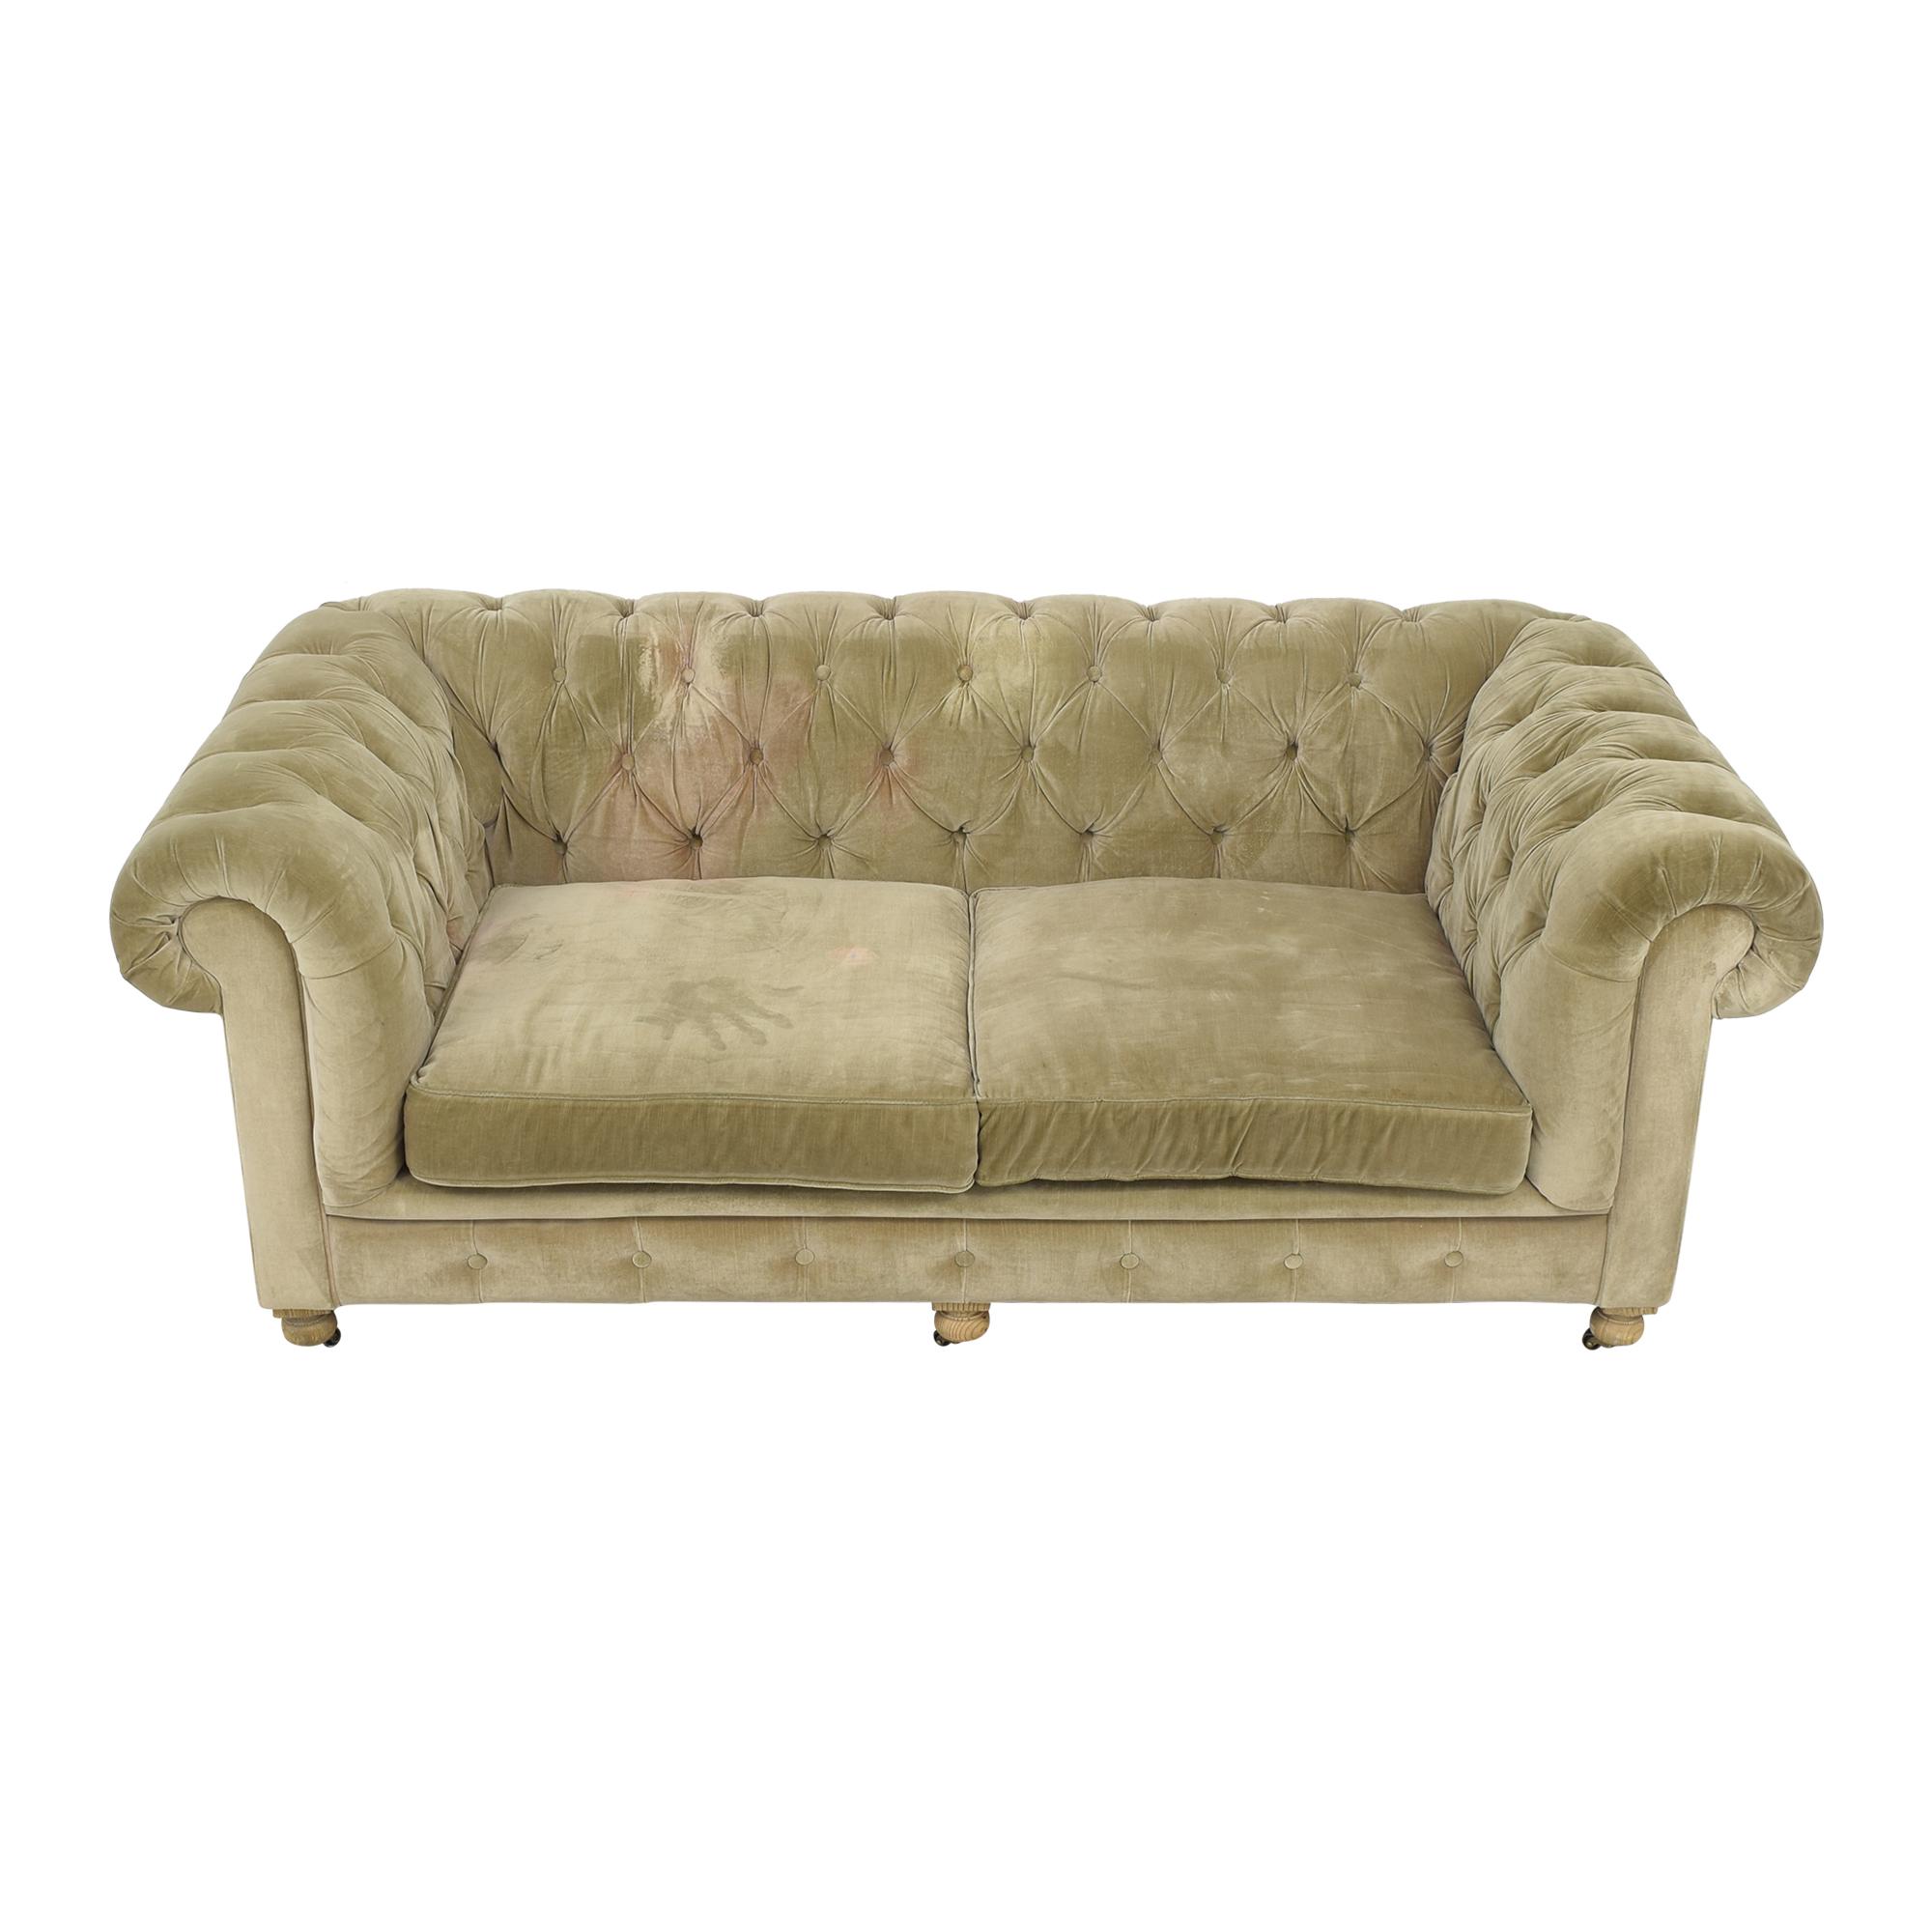 Restoration Hardware Restoration Hardware Kensington Sofa Classic Sofas